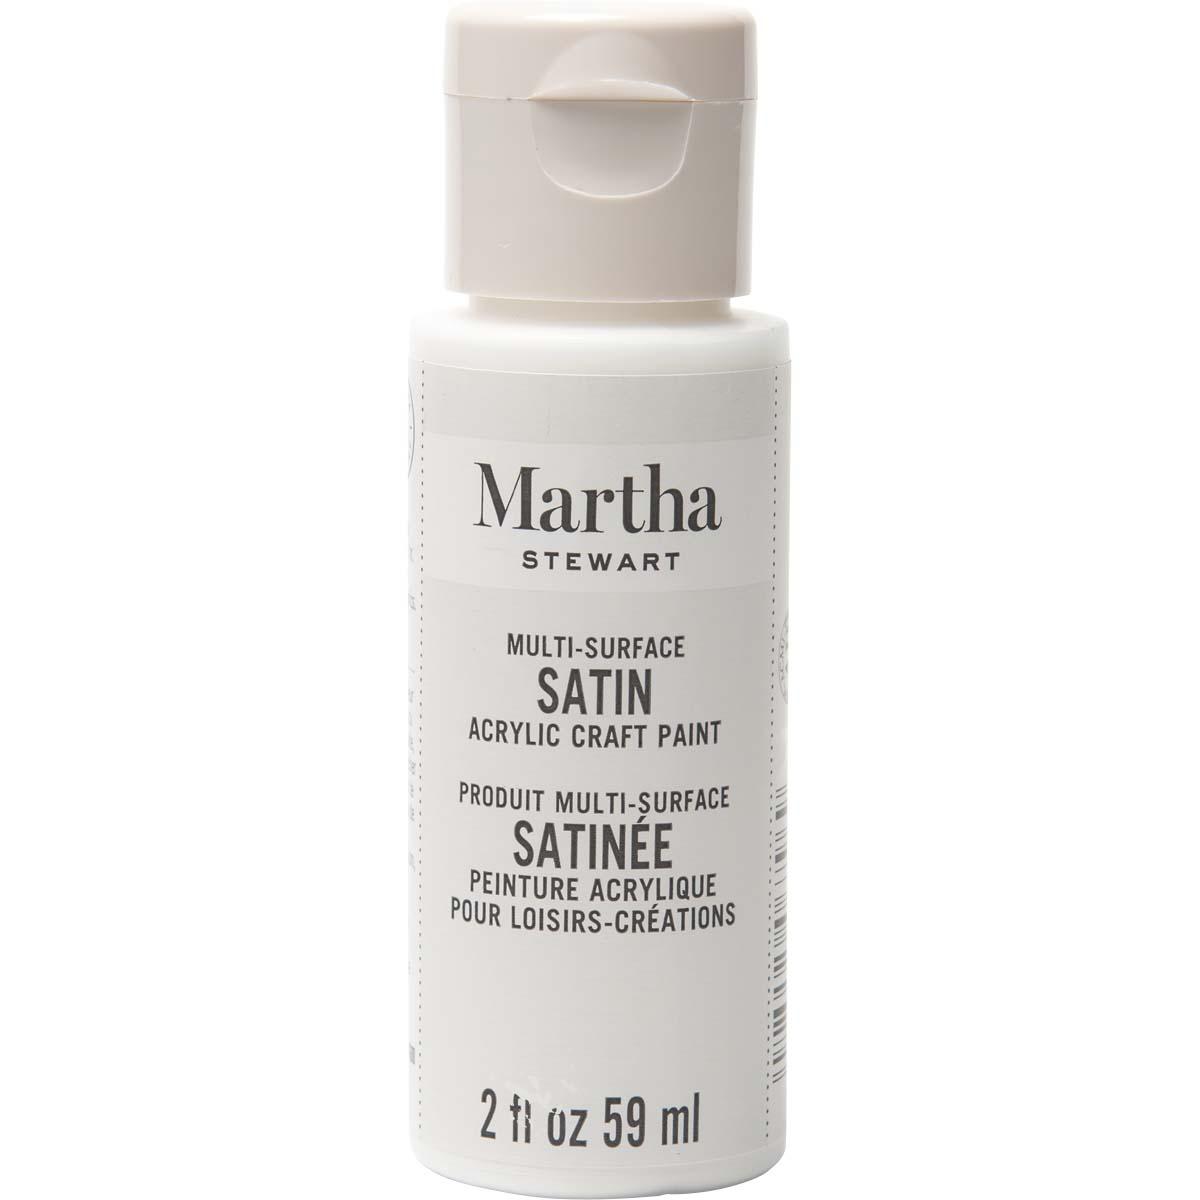 Martha Stewart ® Multi-Surface Satin Acrylic Craft Paint - Wedding Cake, 2 oz. - 32076CA